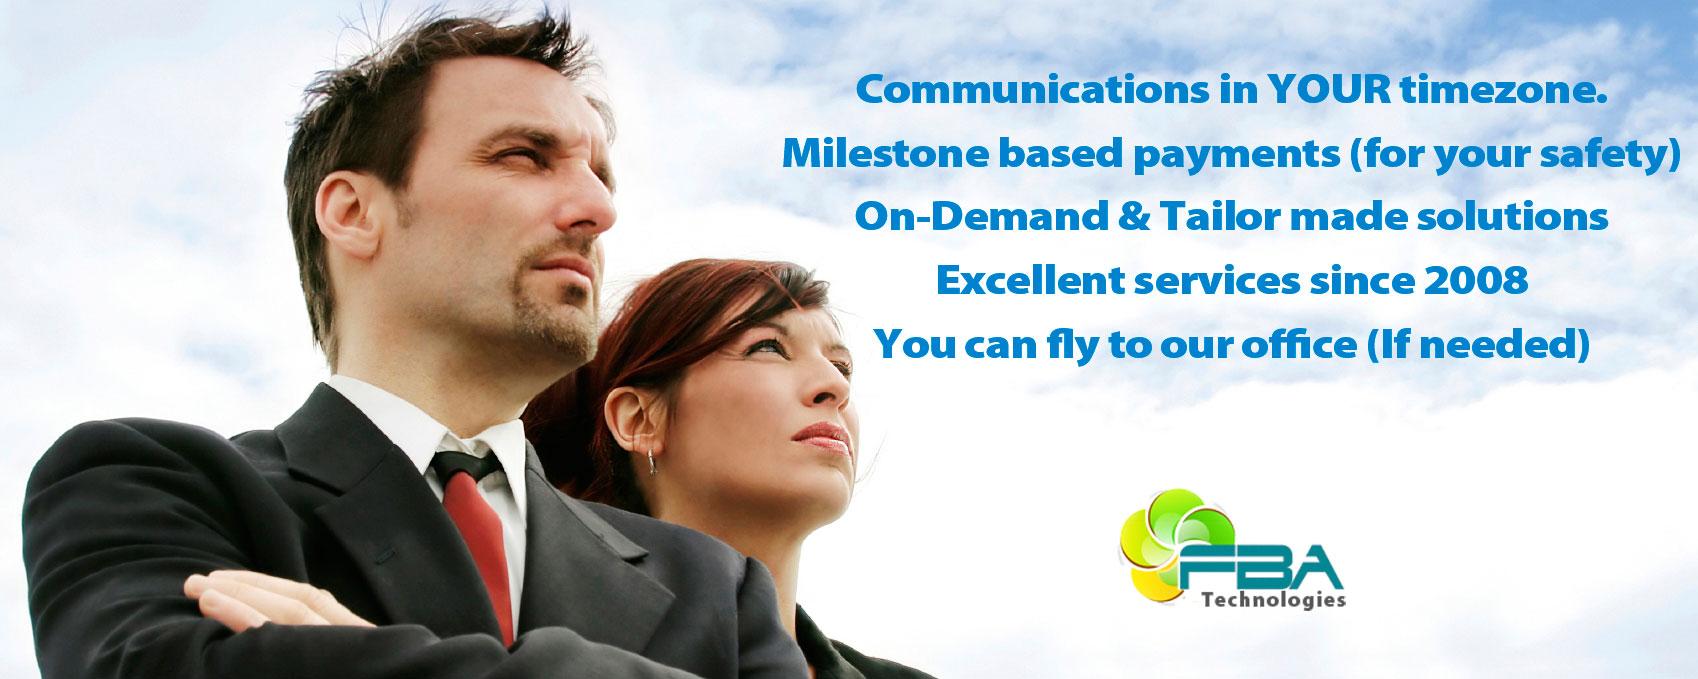 resume making companies sample customer service resume resume making companies avon resumes call 91 9889101010 companies in chennai erp software development companies